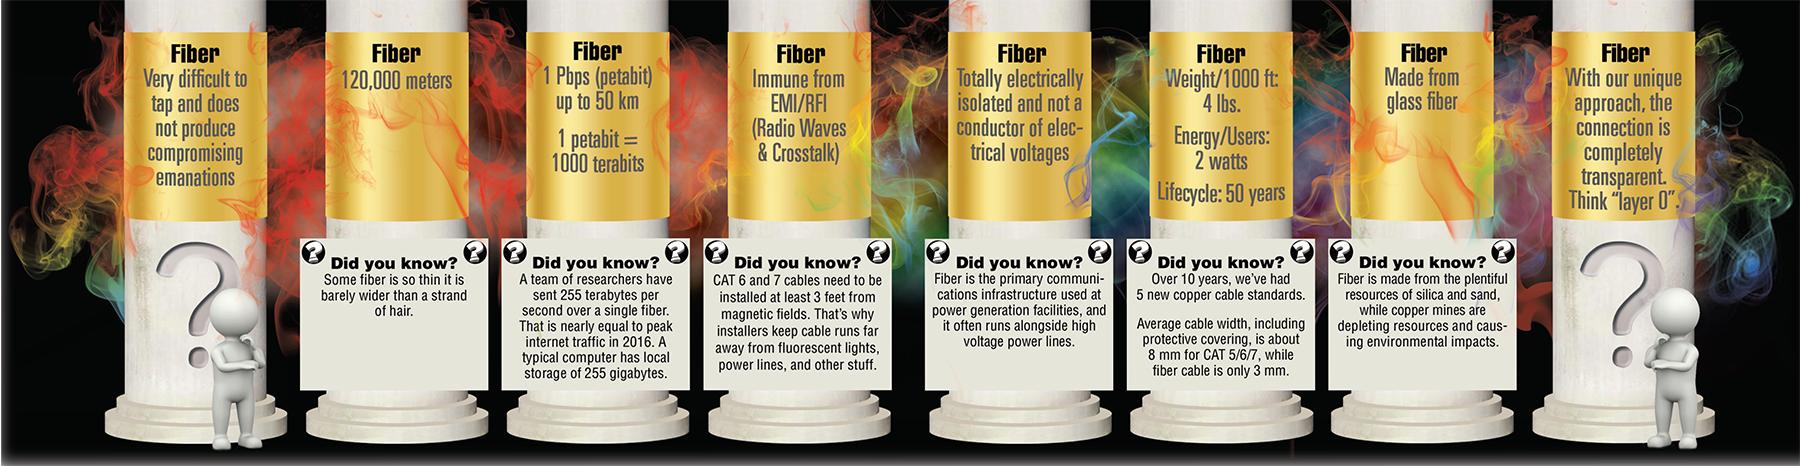 Eight Pillars of Fiber Optics